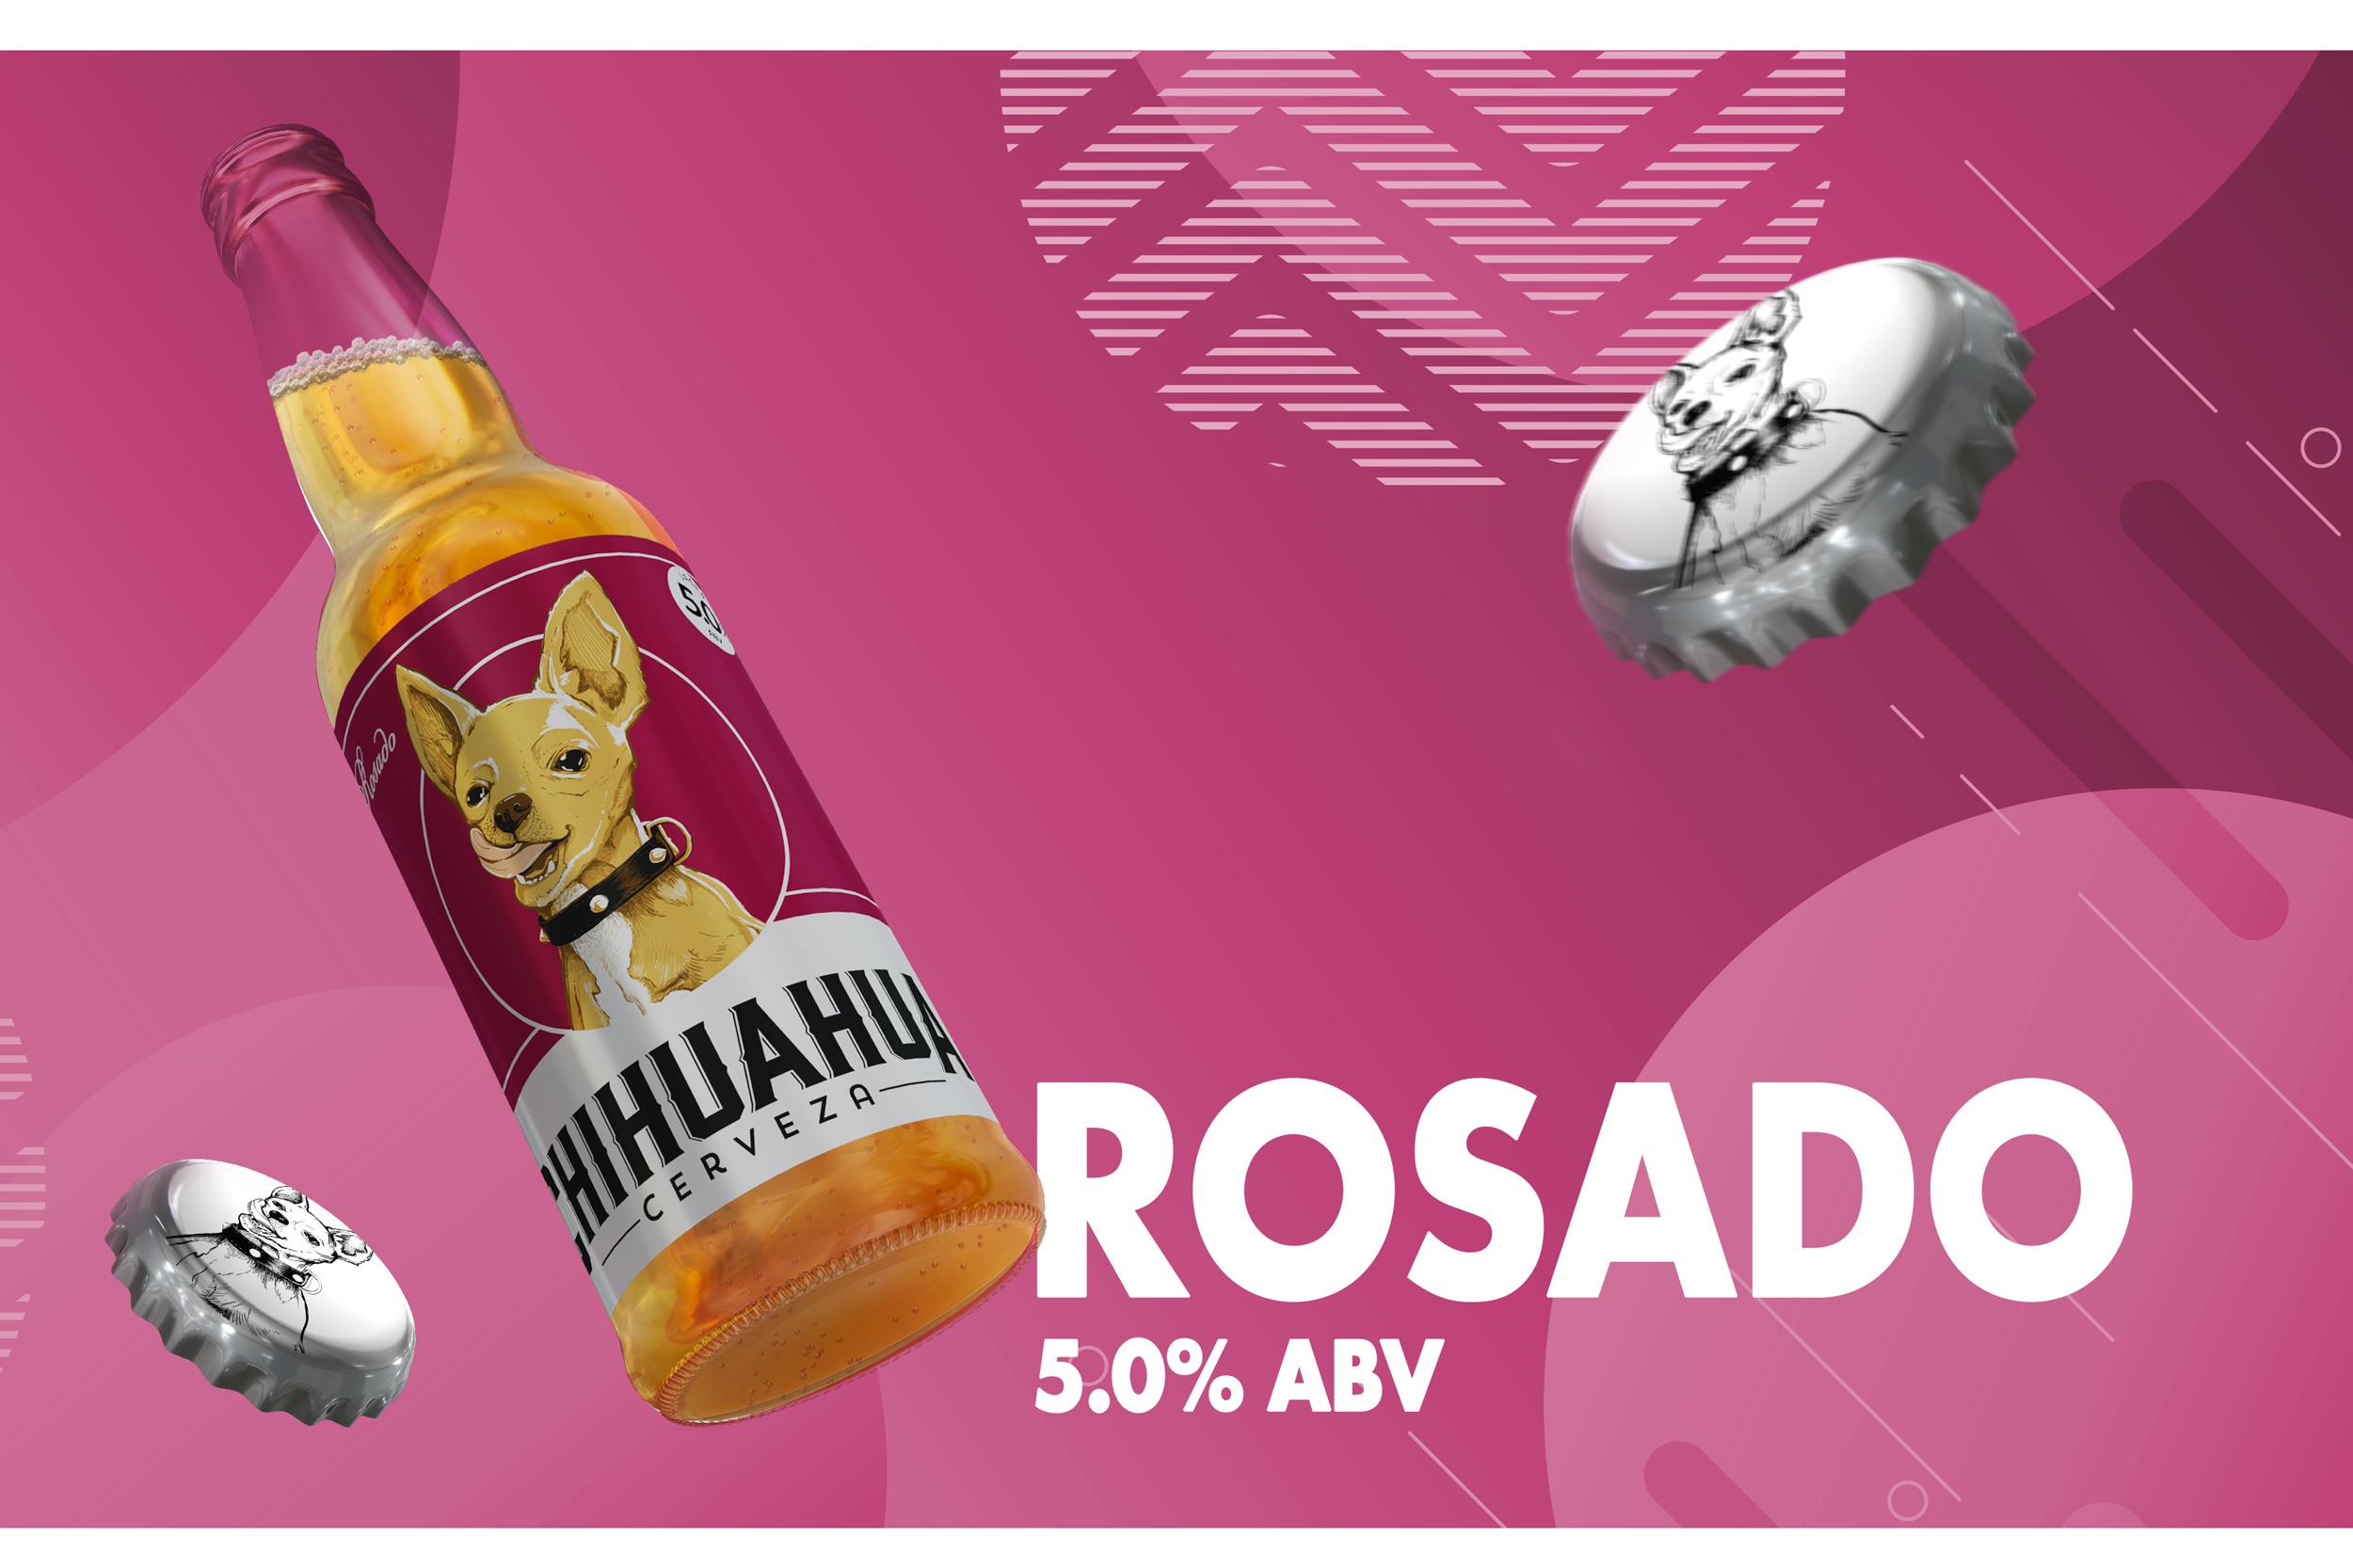 002Rosado-(2).jpg